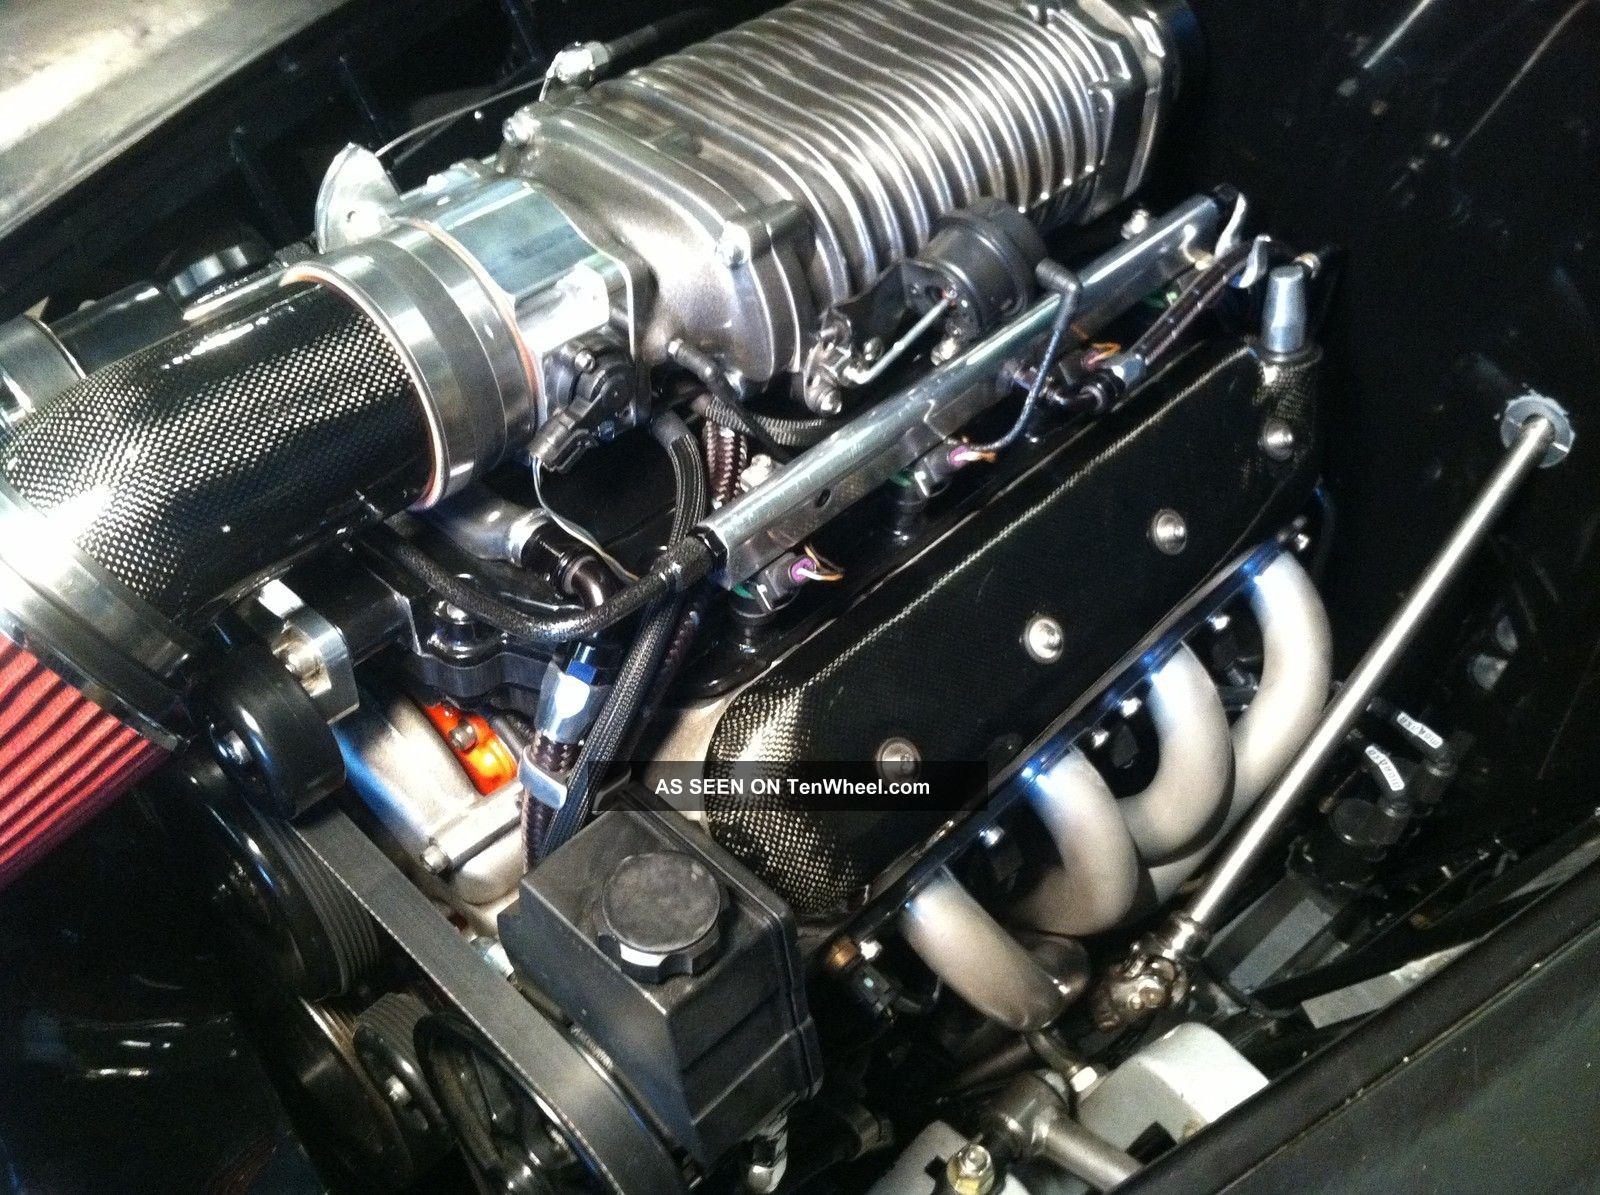 1958 Volvo Duett 445 Blown Ls Motor Bagged Cruiser